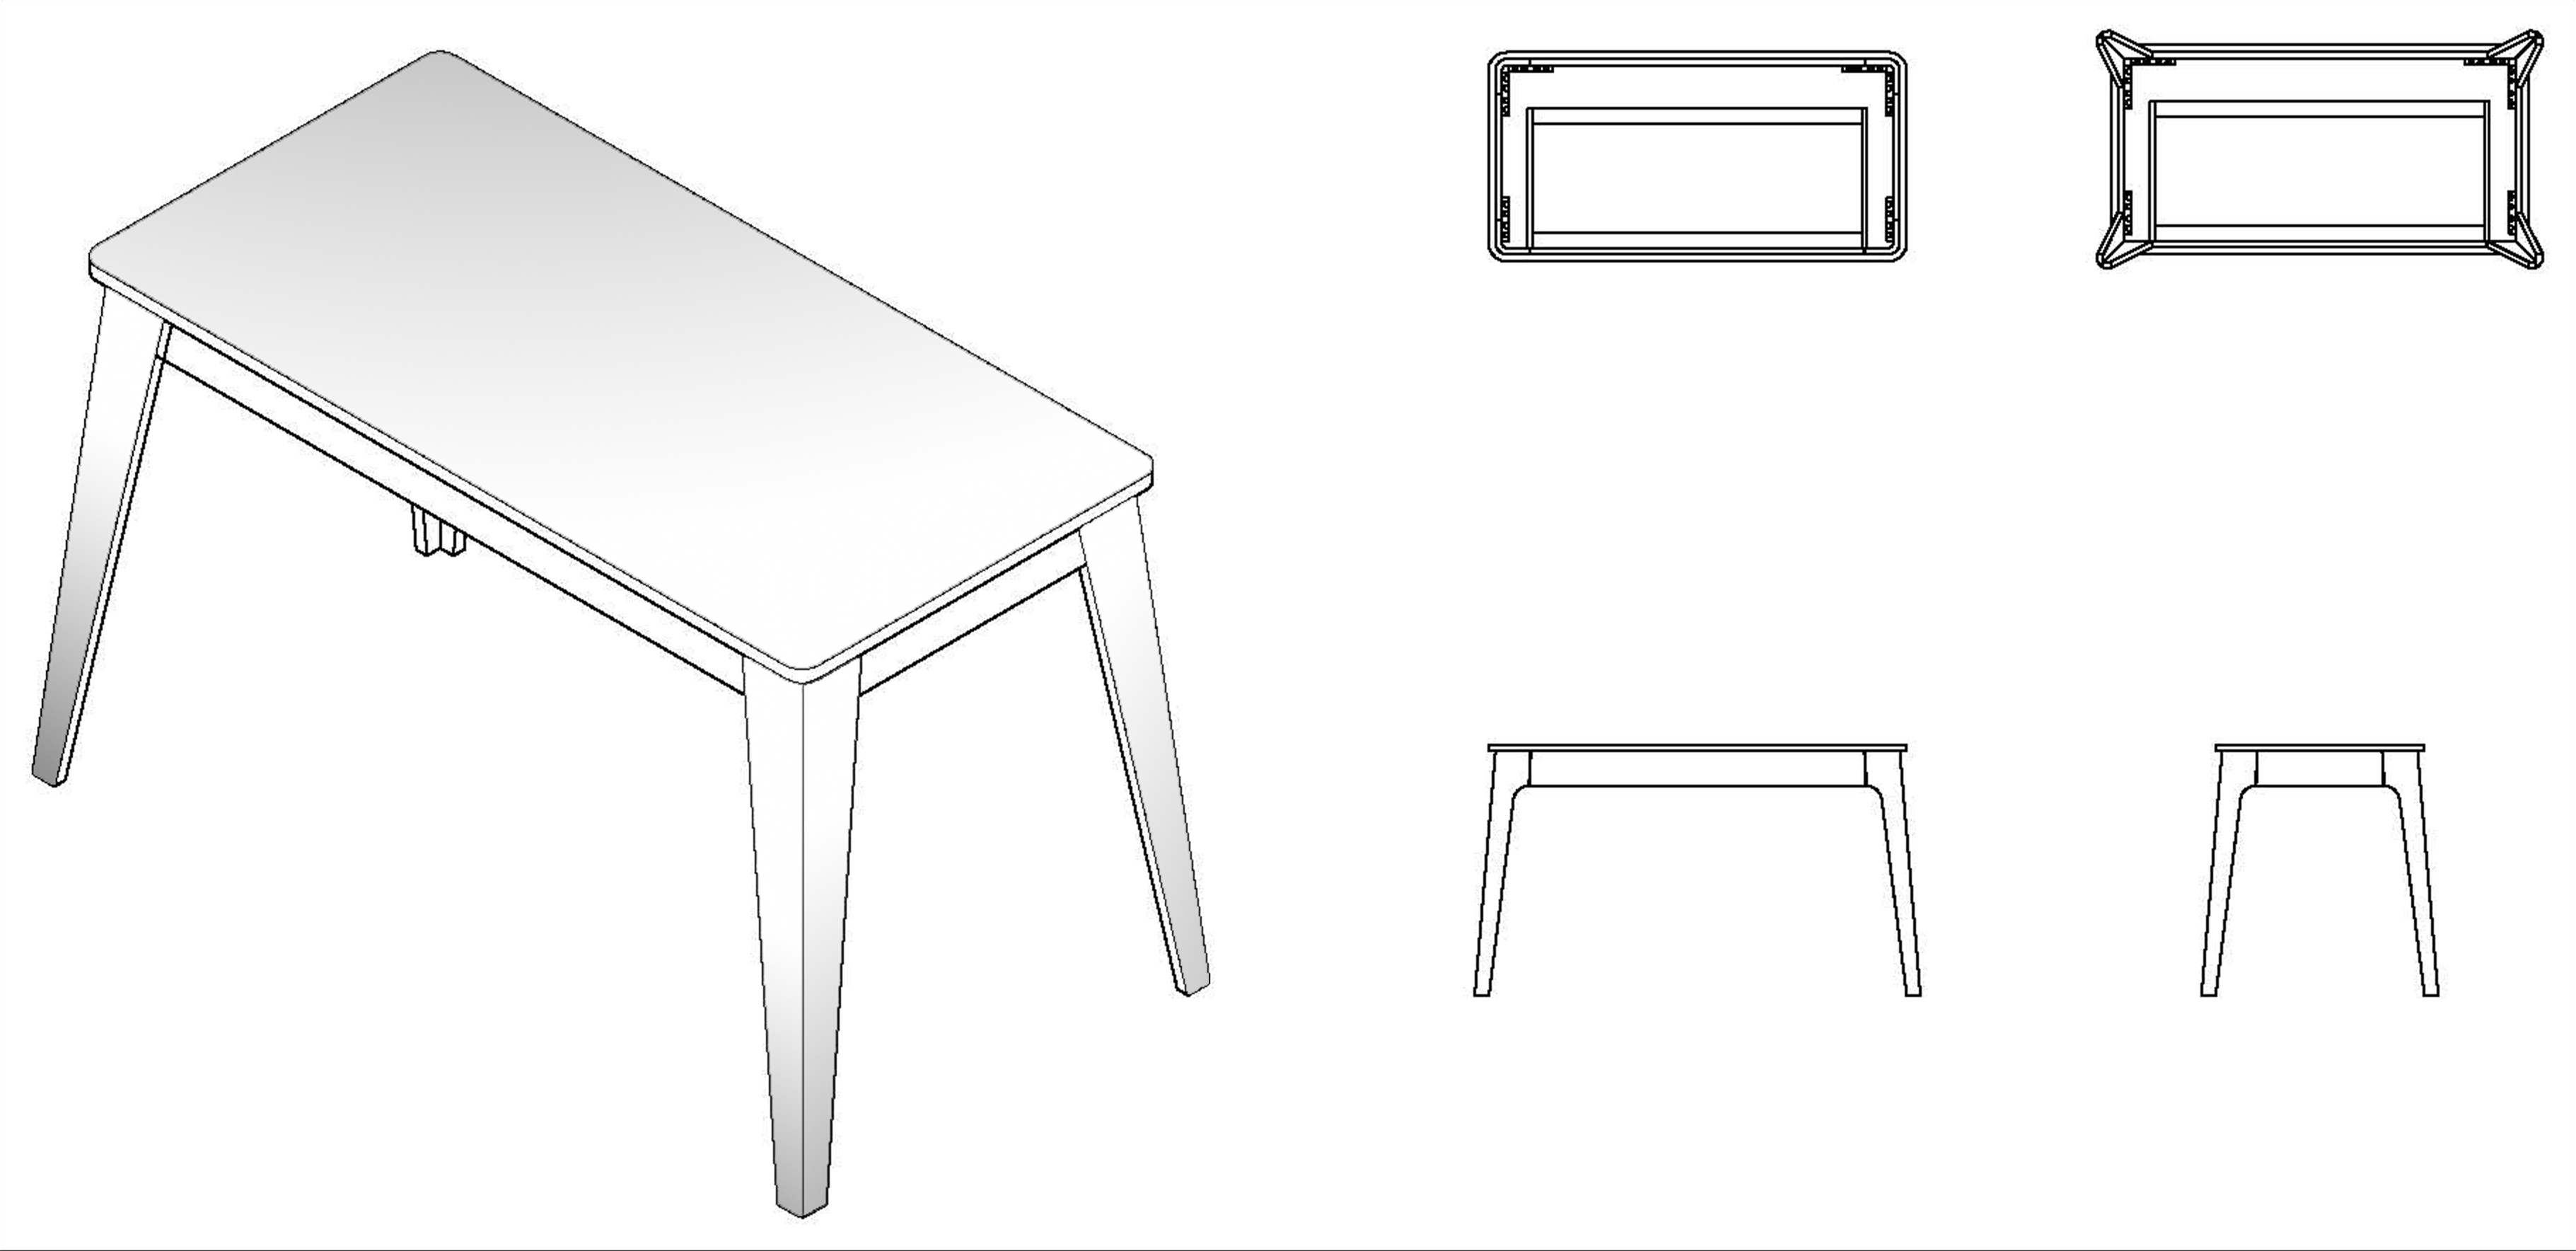 Carpentry 101